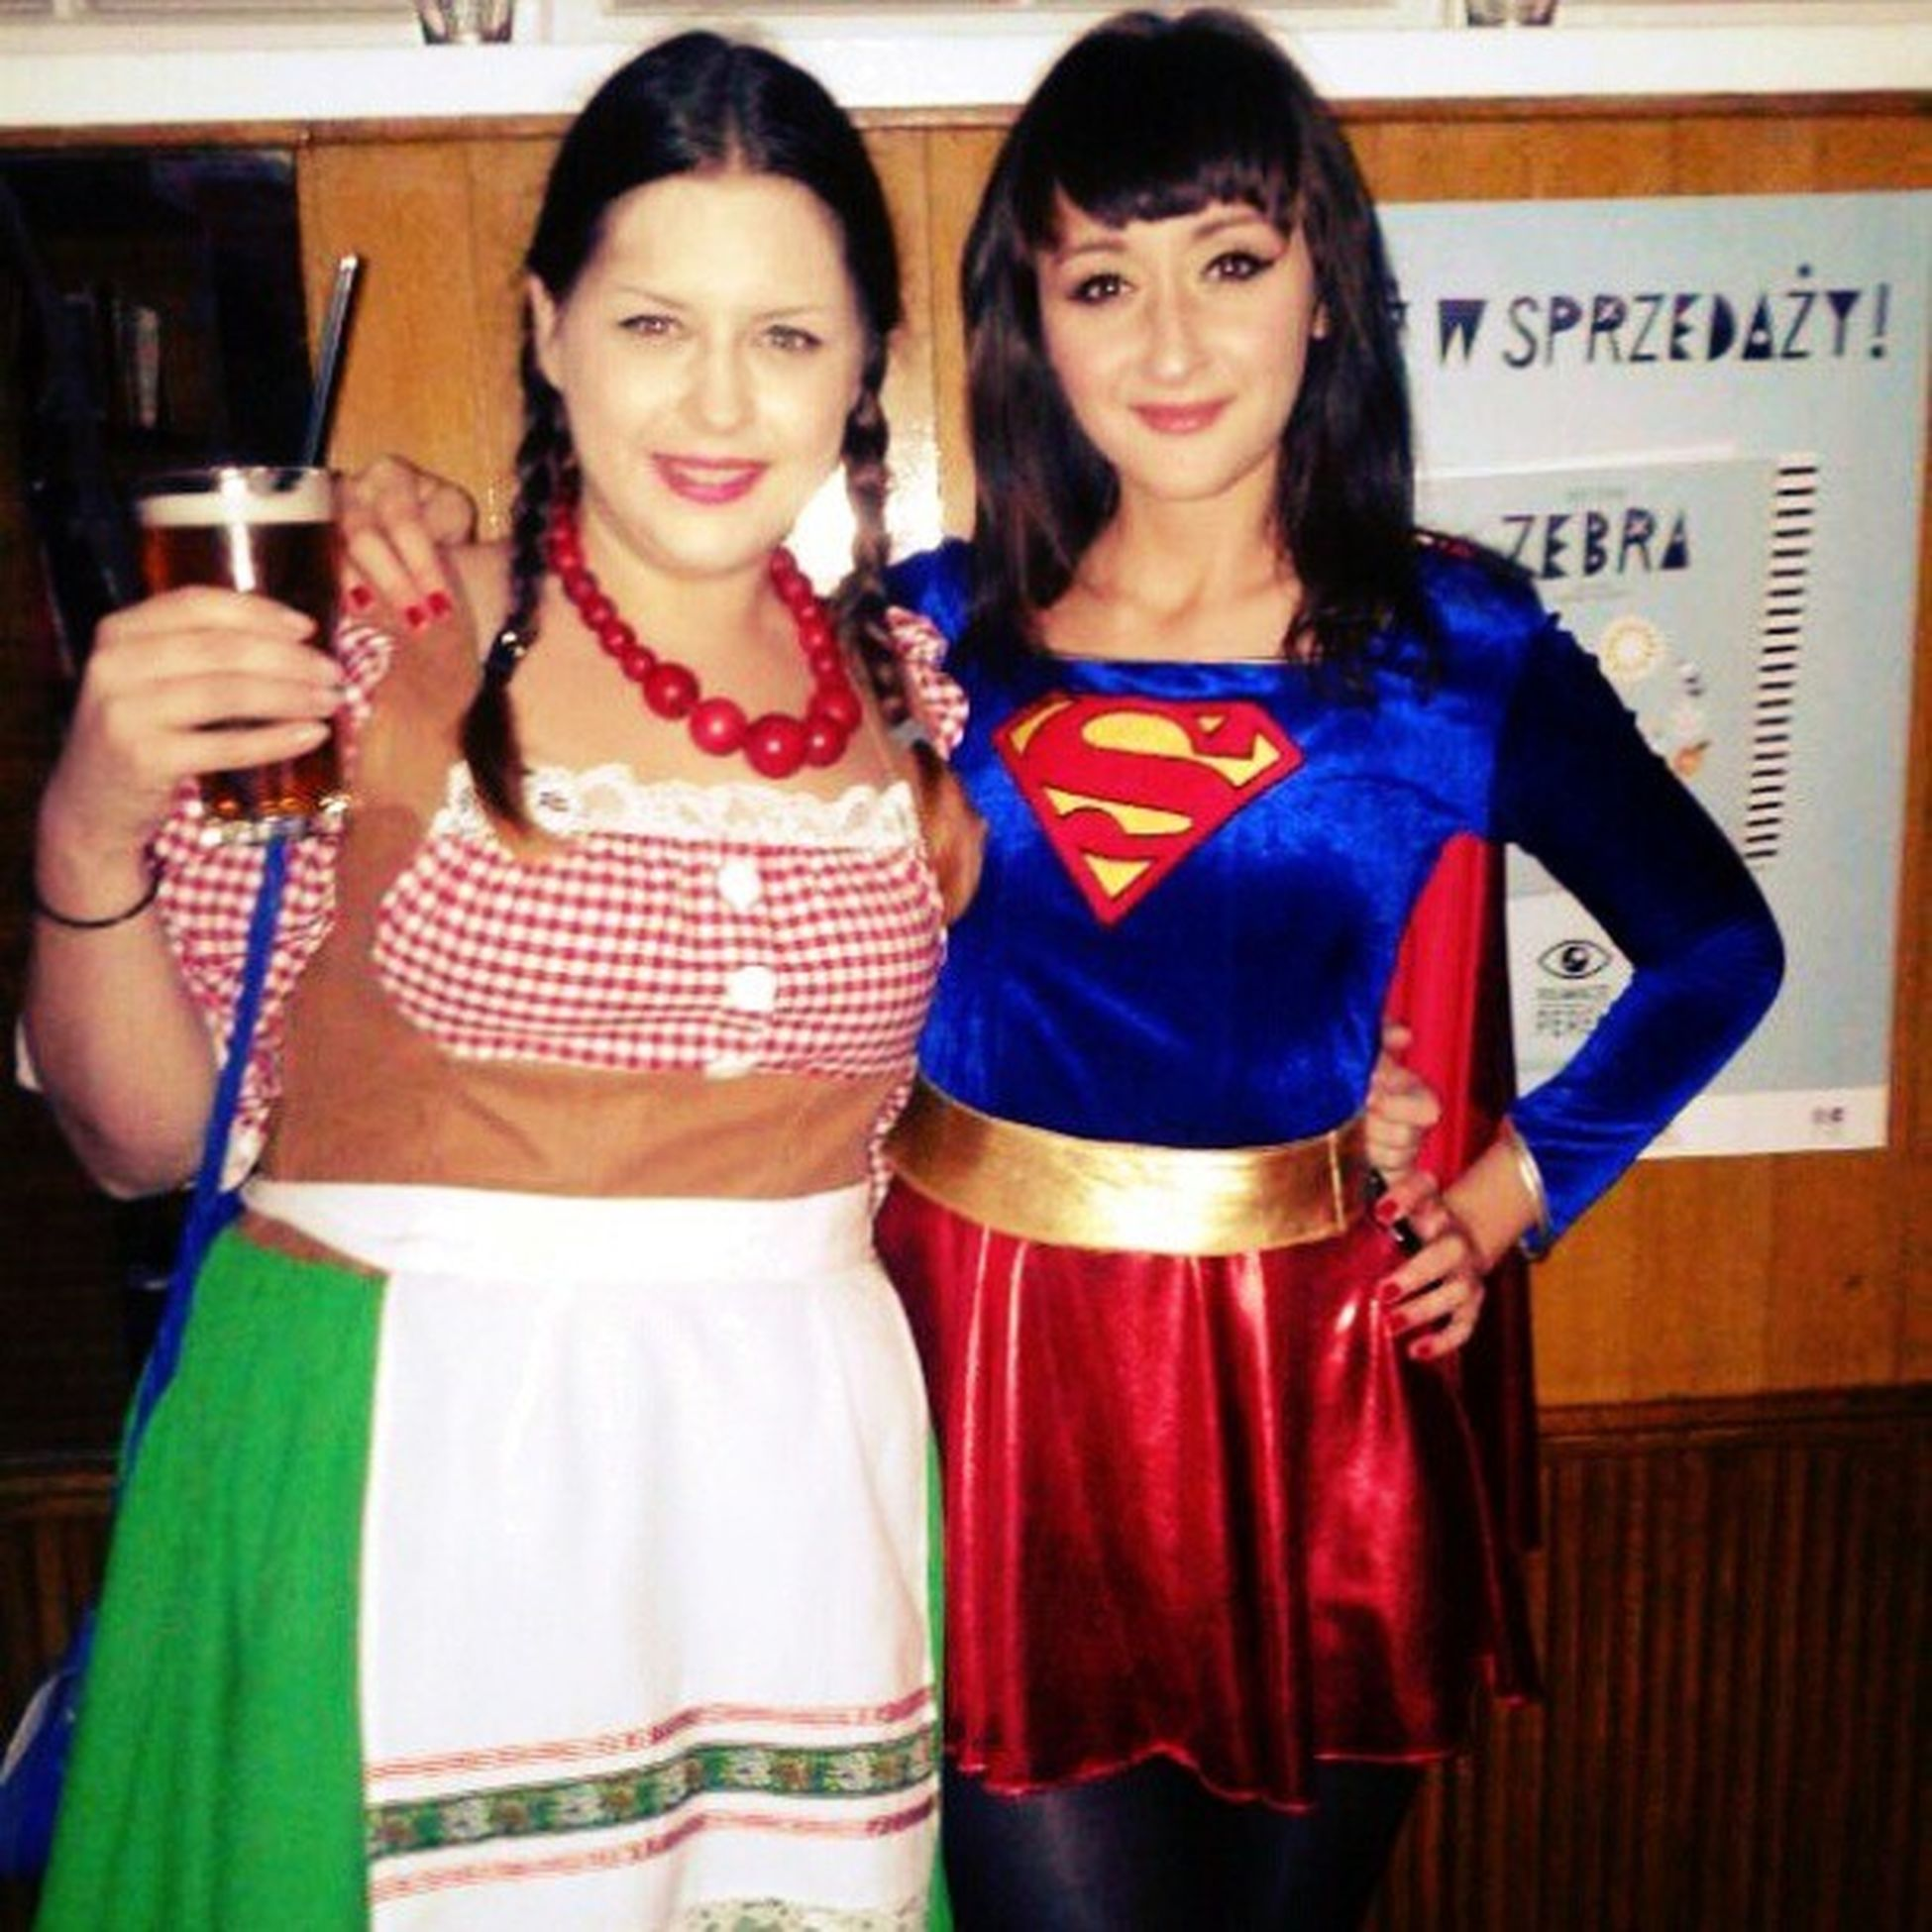 Halloween Party Impreza Dzik Super_girl Kostium Friends Beautiful Girl Jest_super